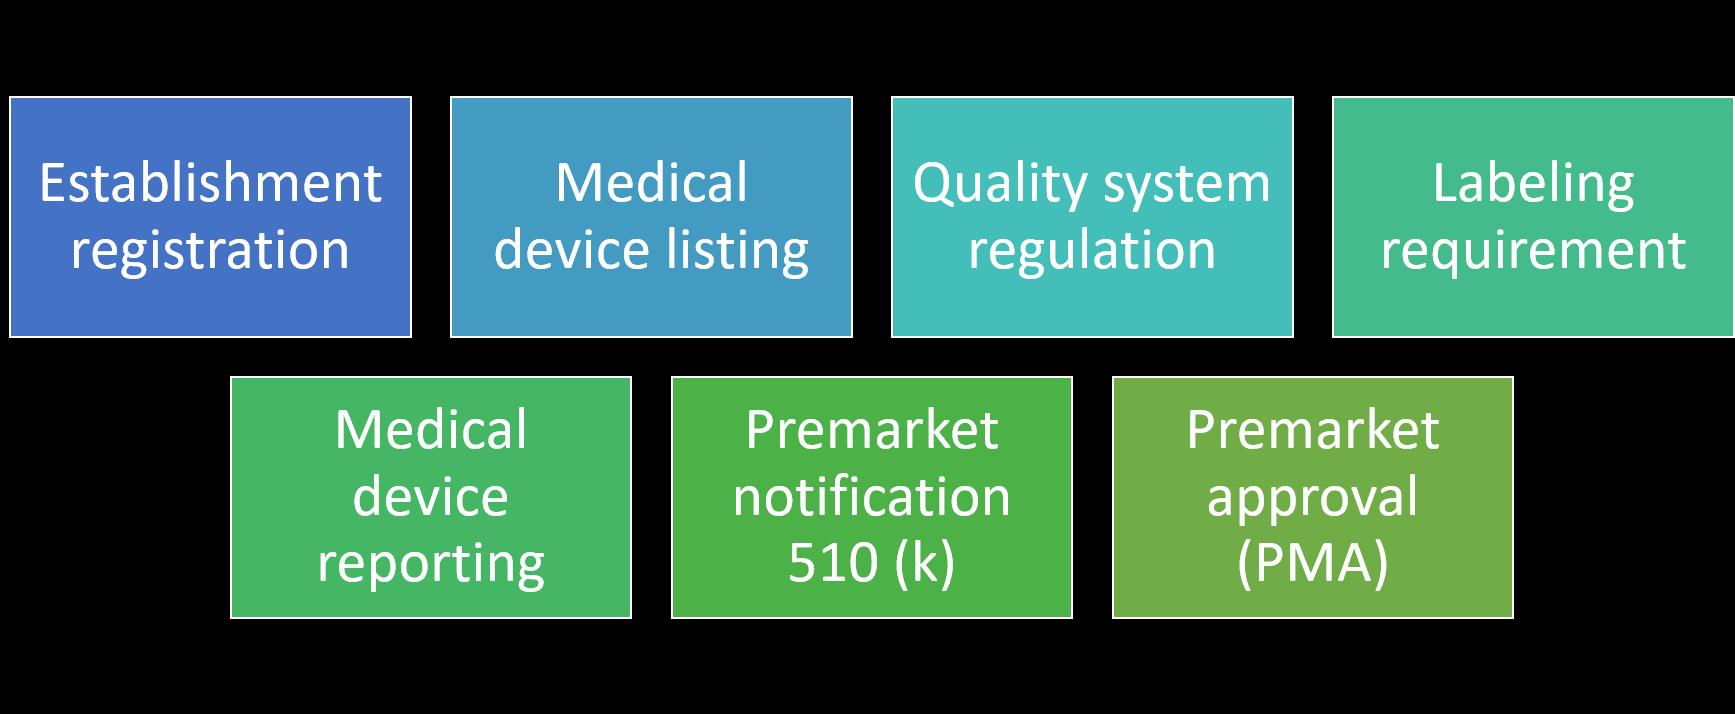 FDA regulation aspects